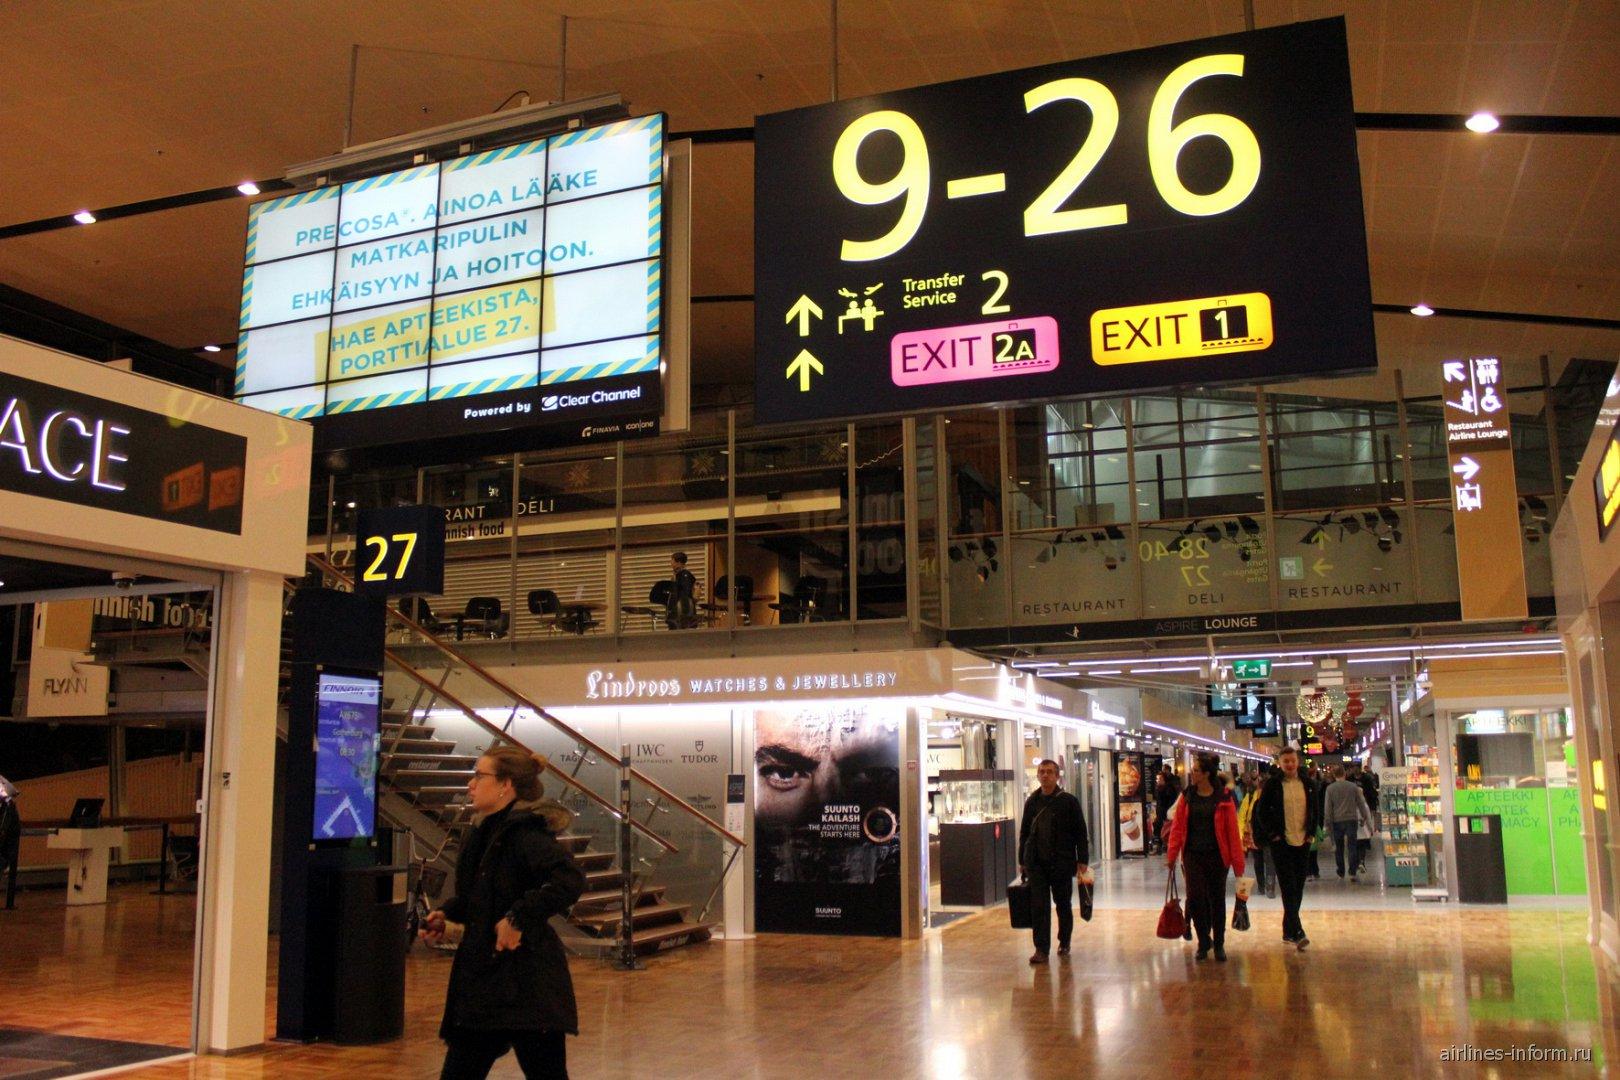 В терминале 2 аэропорта Хельсинки Вантаа